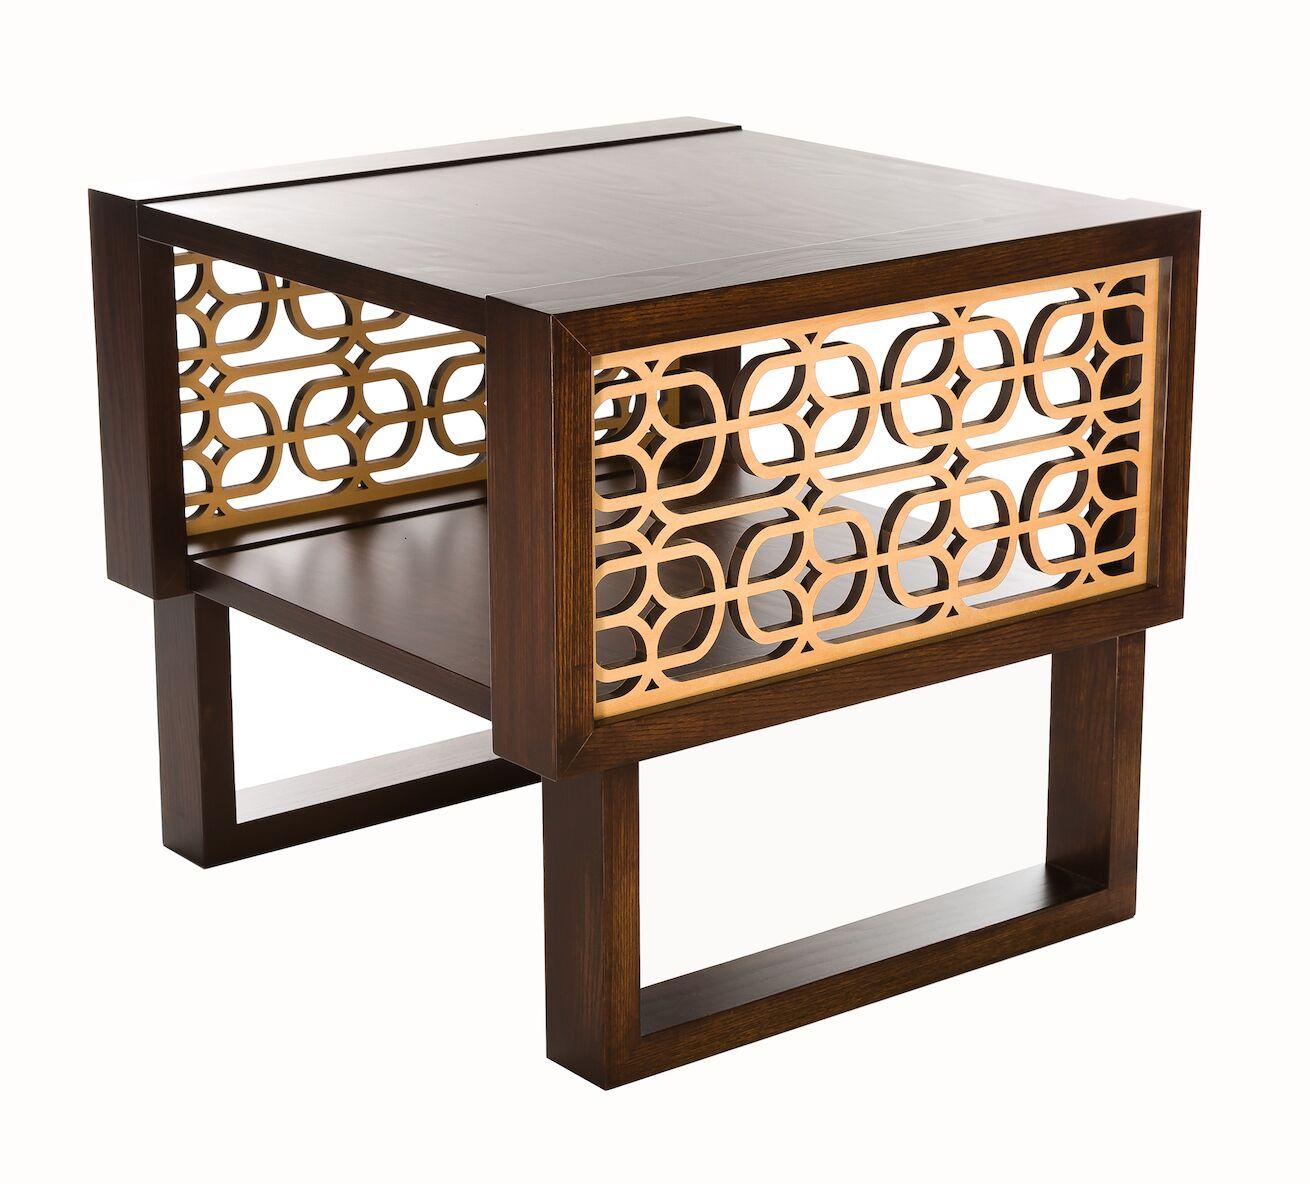 Herren Grille End Table Table Top Color: Espresso, Table Base Color: Espresso/Natural